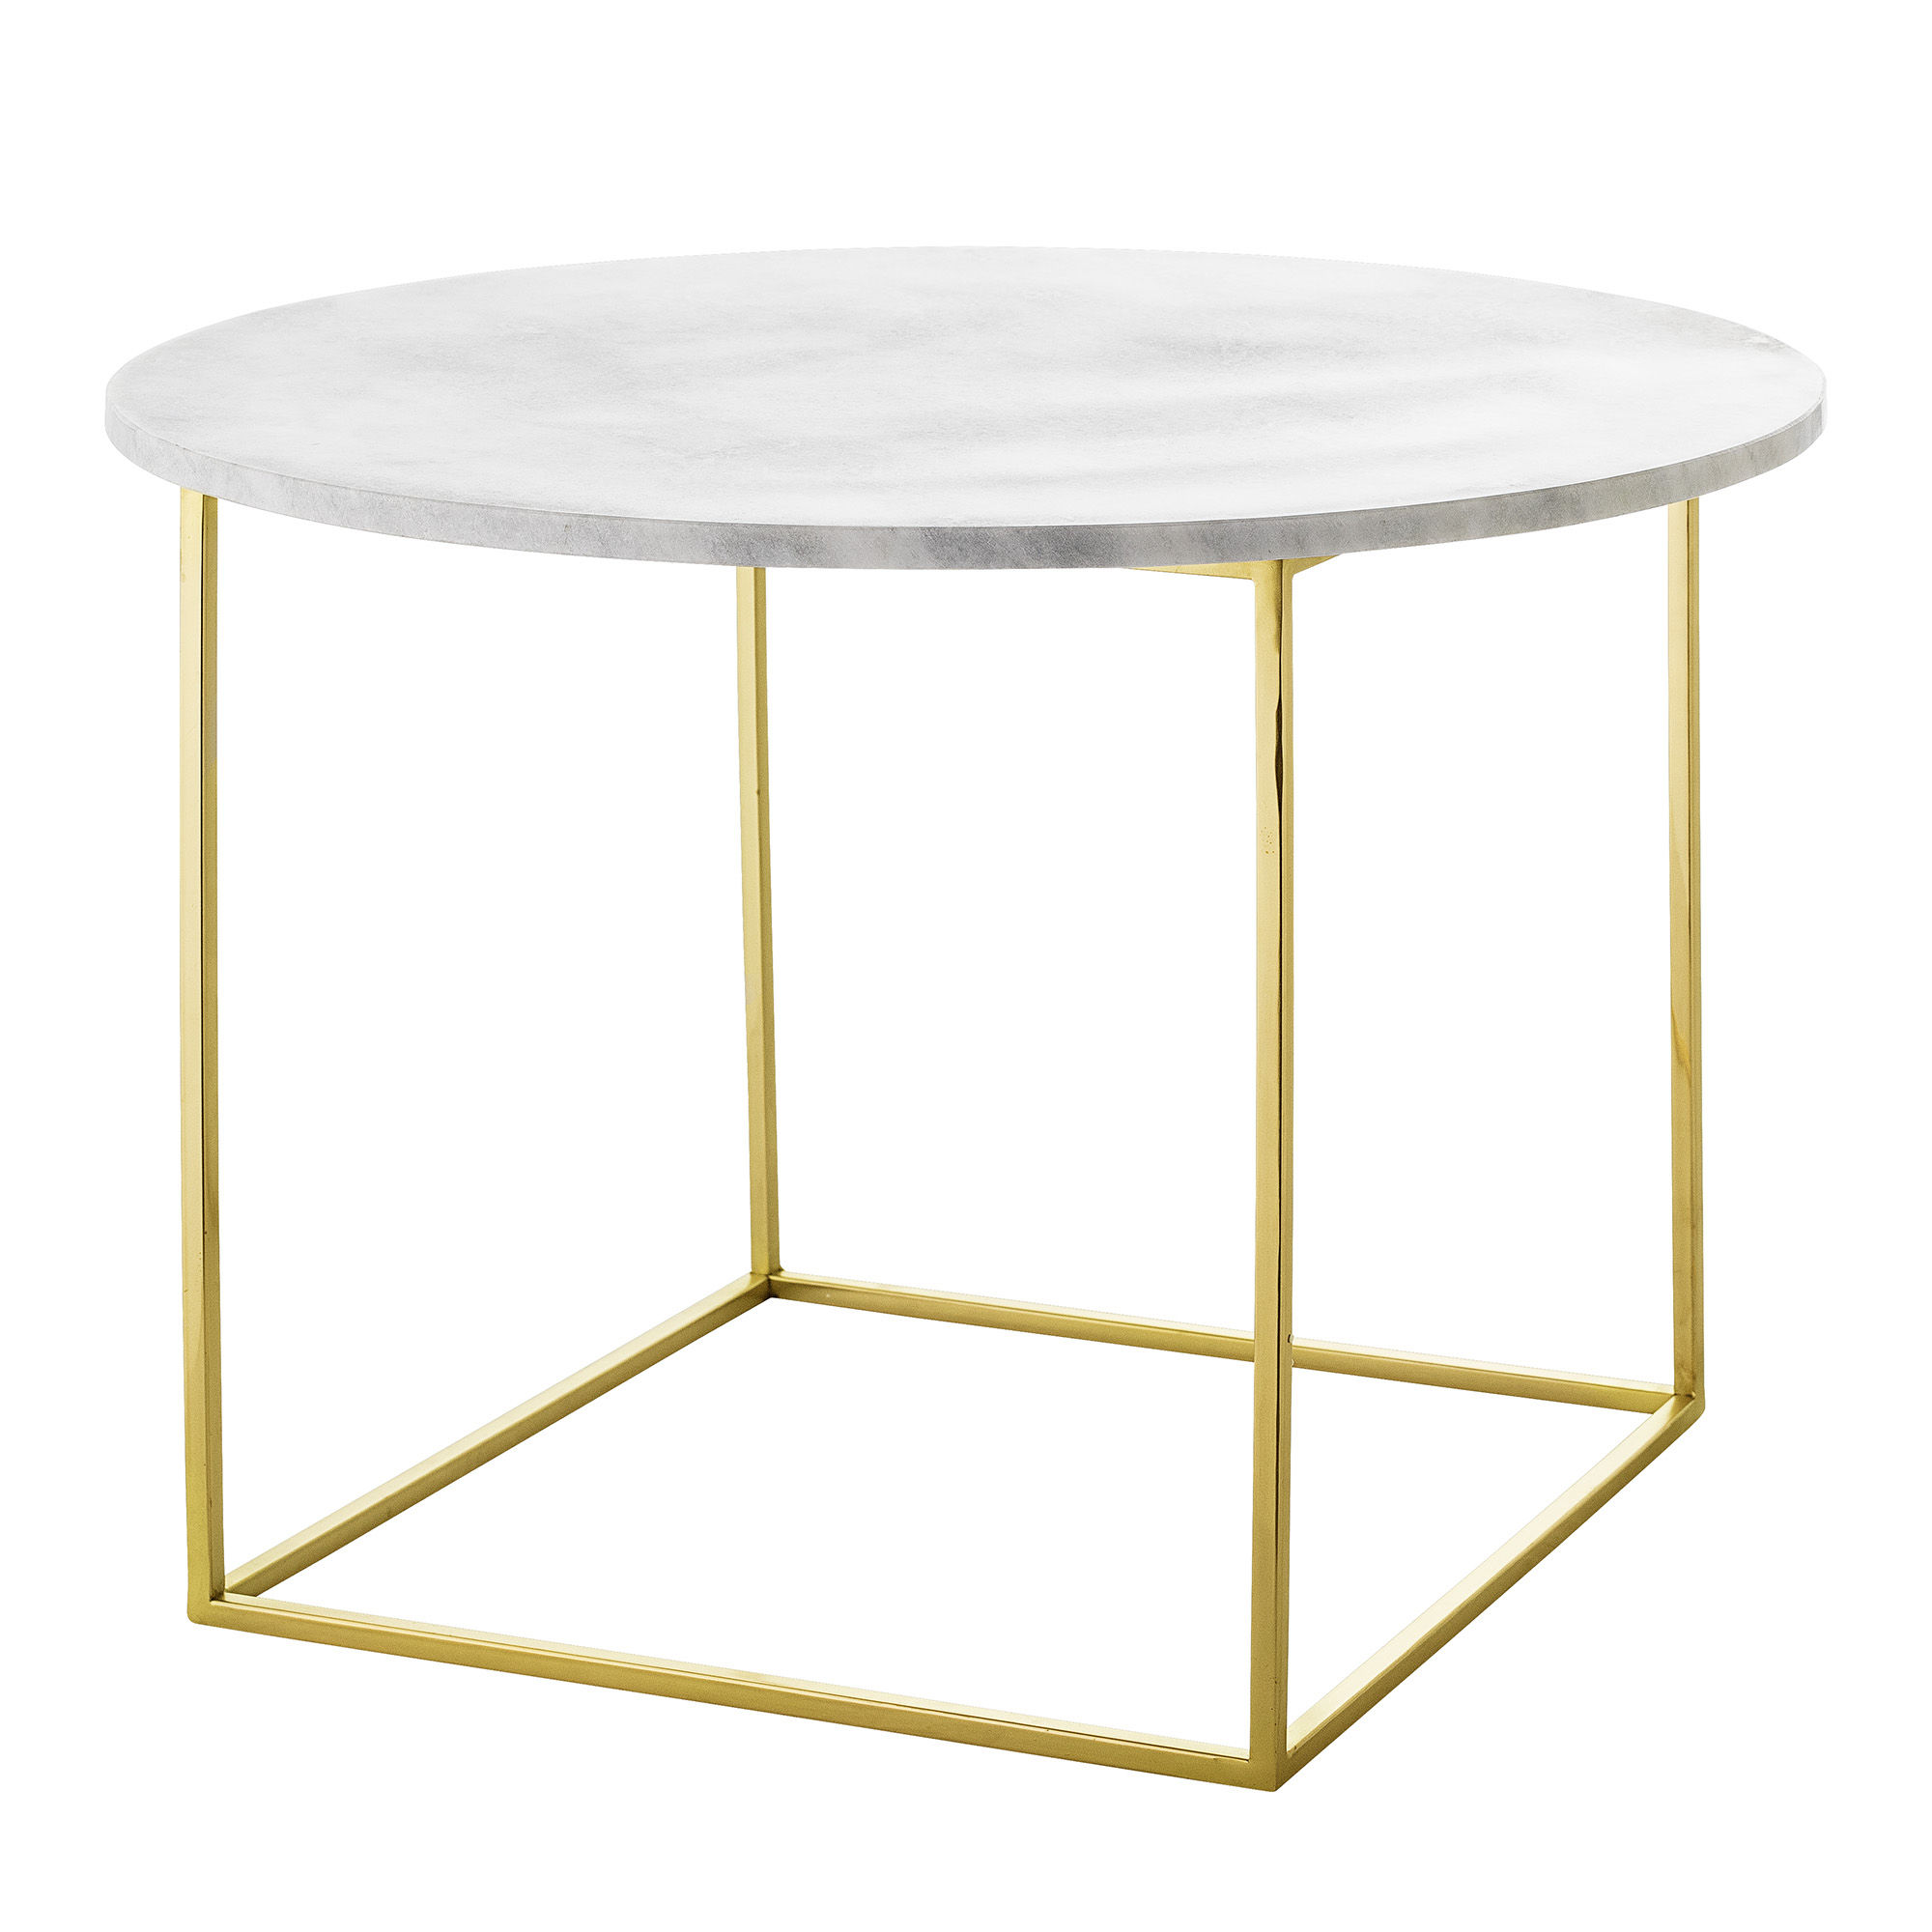 Mobilier - Tables basses - Table basse Eva / Marbre - Ø 60 cm - Bloomingville - Marbre blanc / Or - Fer finition dorée, Marbre